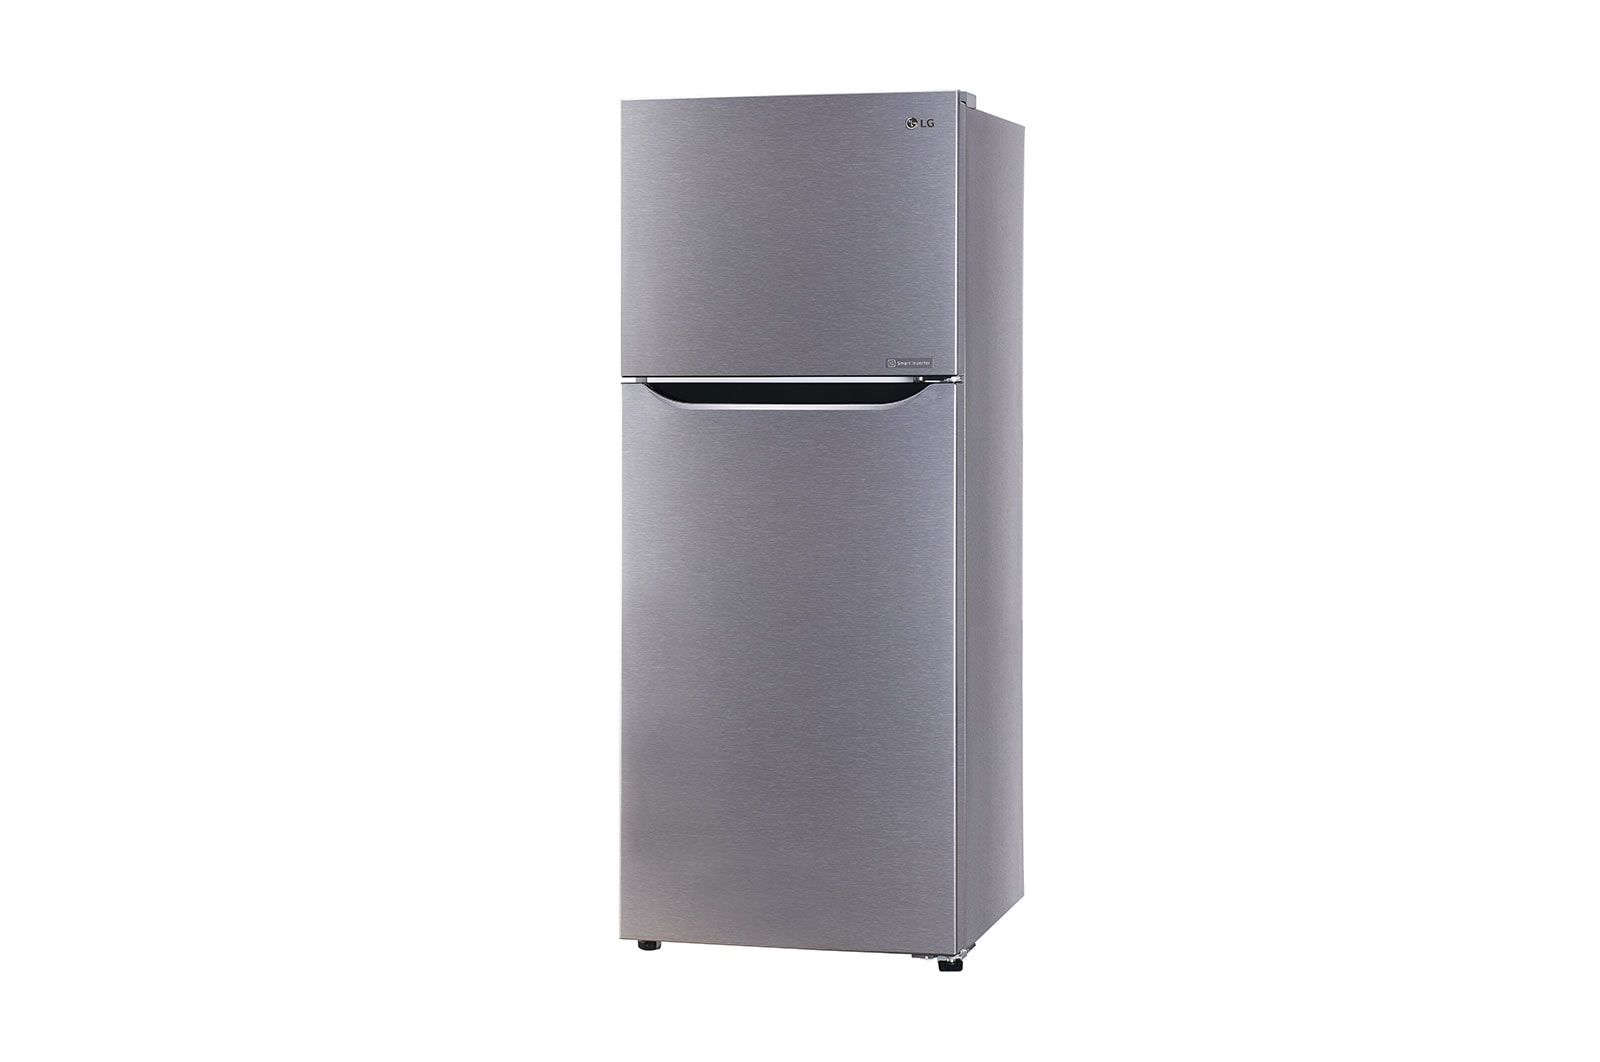 260 Litres Frost Free Refrigerator With Smart Inverter Compressor Multi Air Flow Led Lighting Moist N Fresh